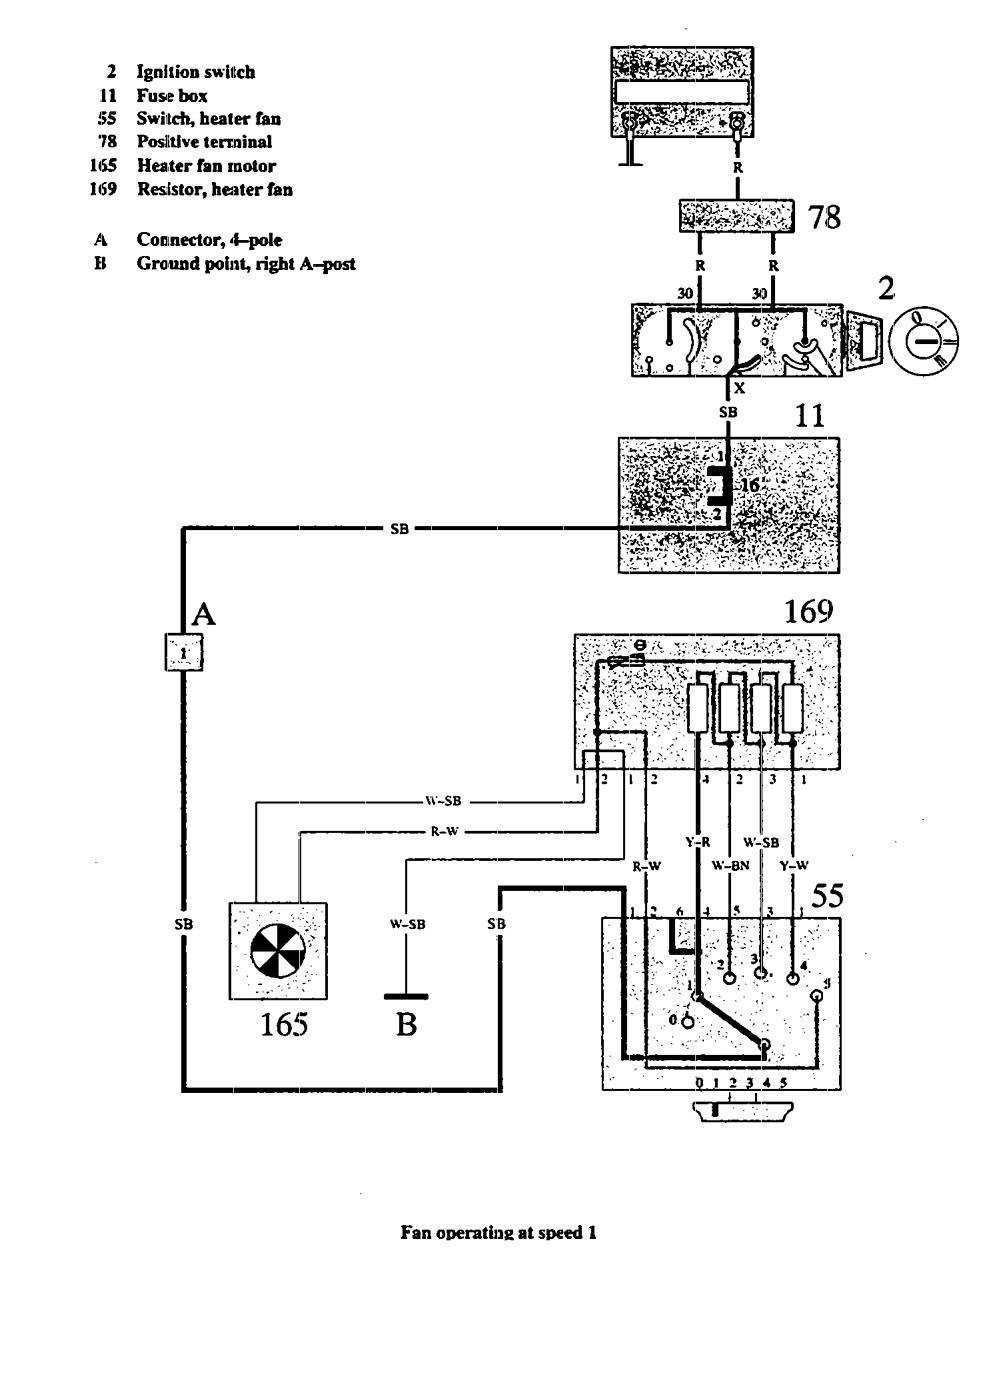 2003 Honda Accord Fuse Box Diagram Volvo 940 1991 Wiring Diagrams Heater Fans